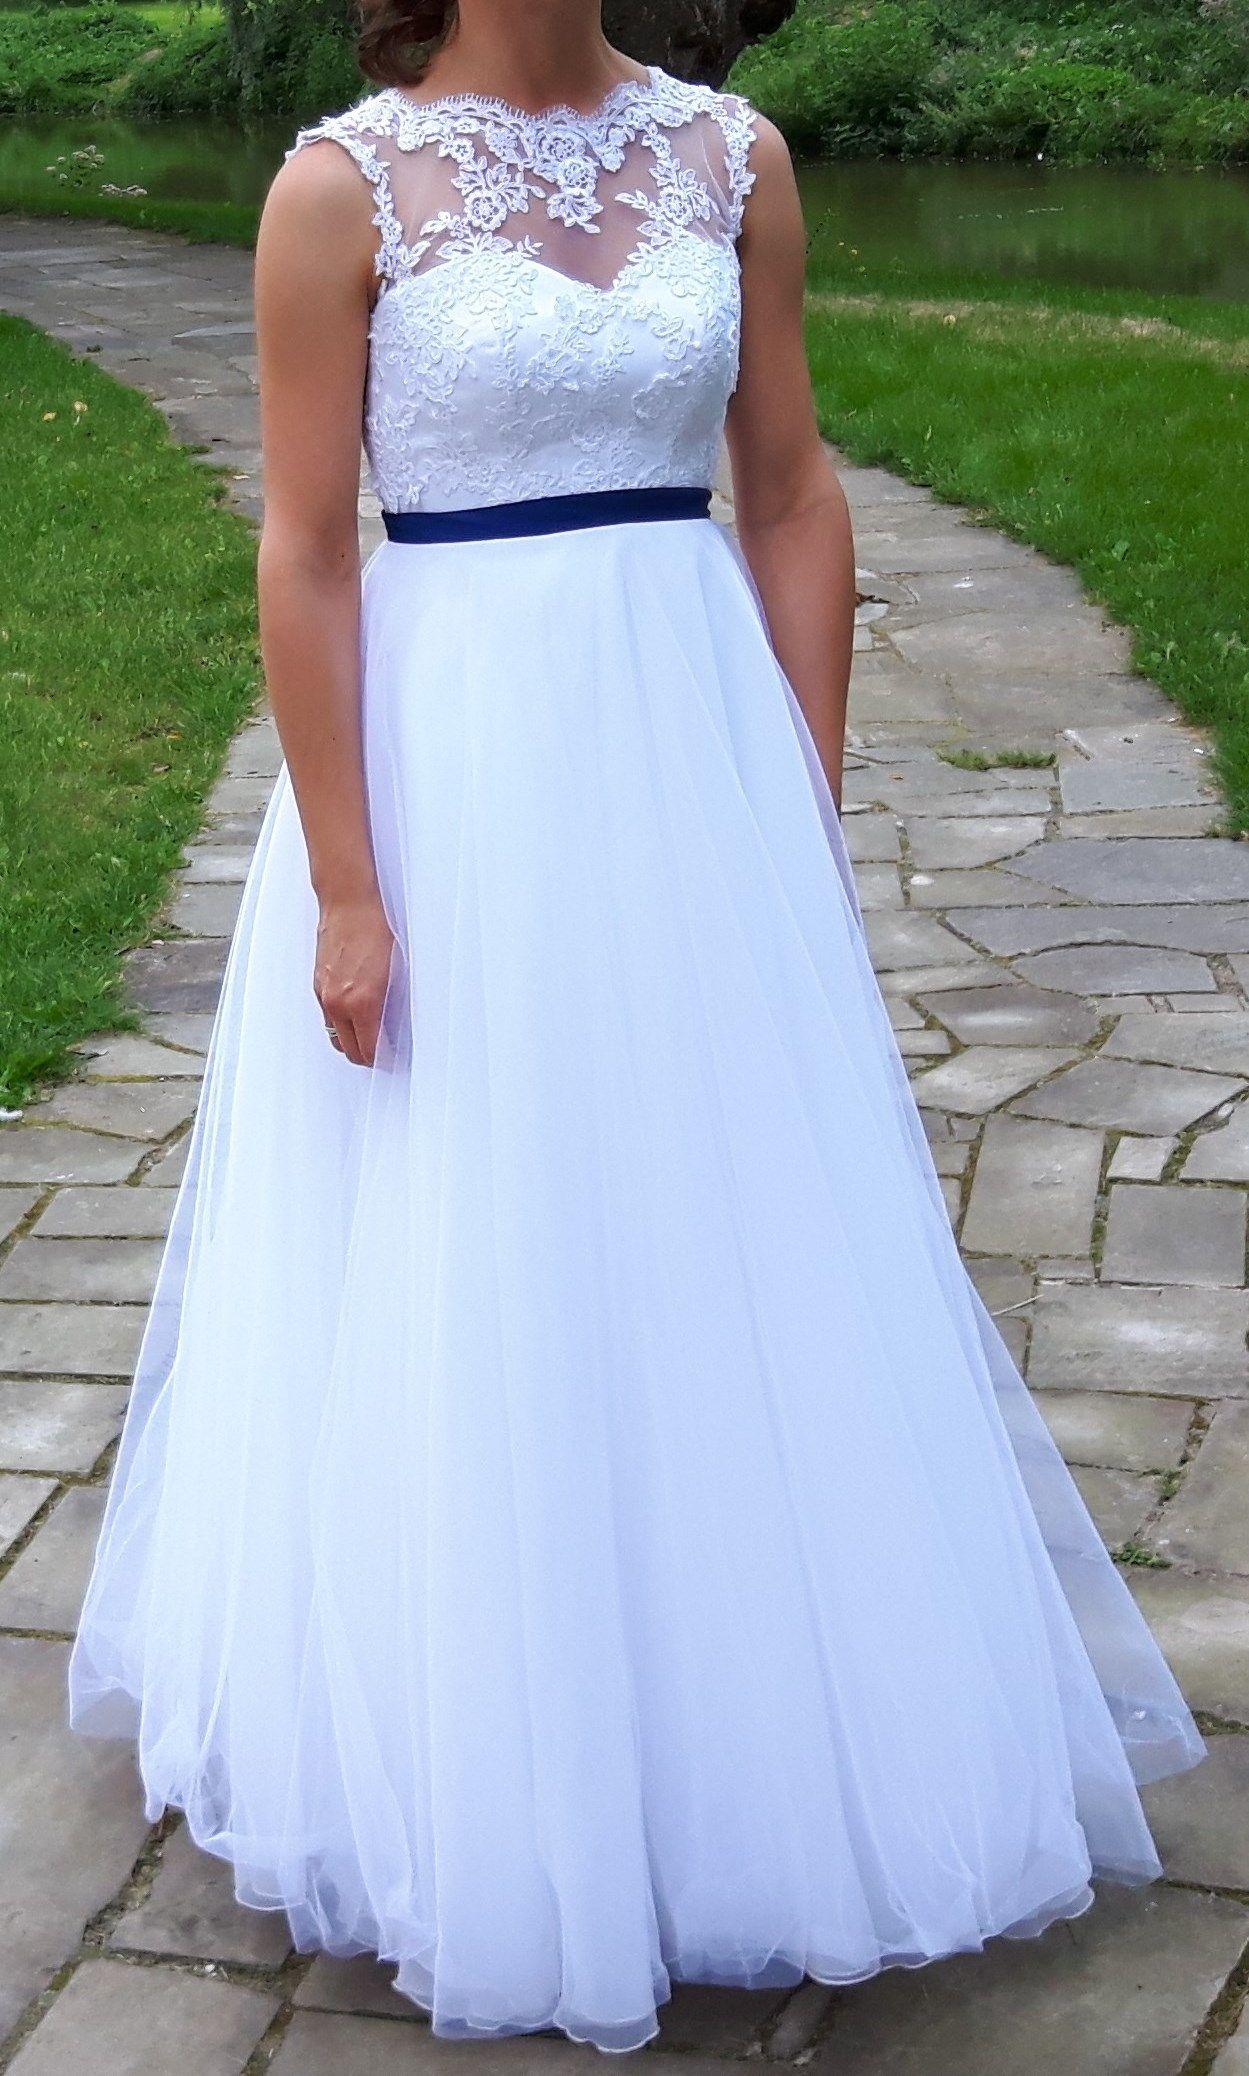 Suknia Slubna 2 W 1 Koronkowa Krotka I Dluga Z Gra 6807768004 Oficjalne Archiwum Allegro Formal Dresses Dresses Wedding Dresses